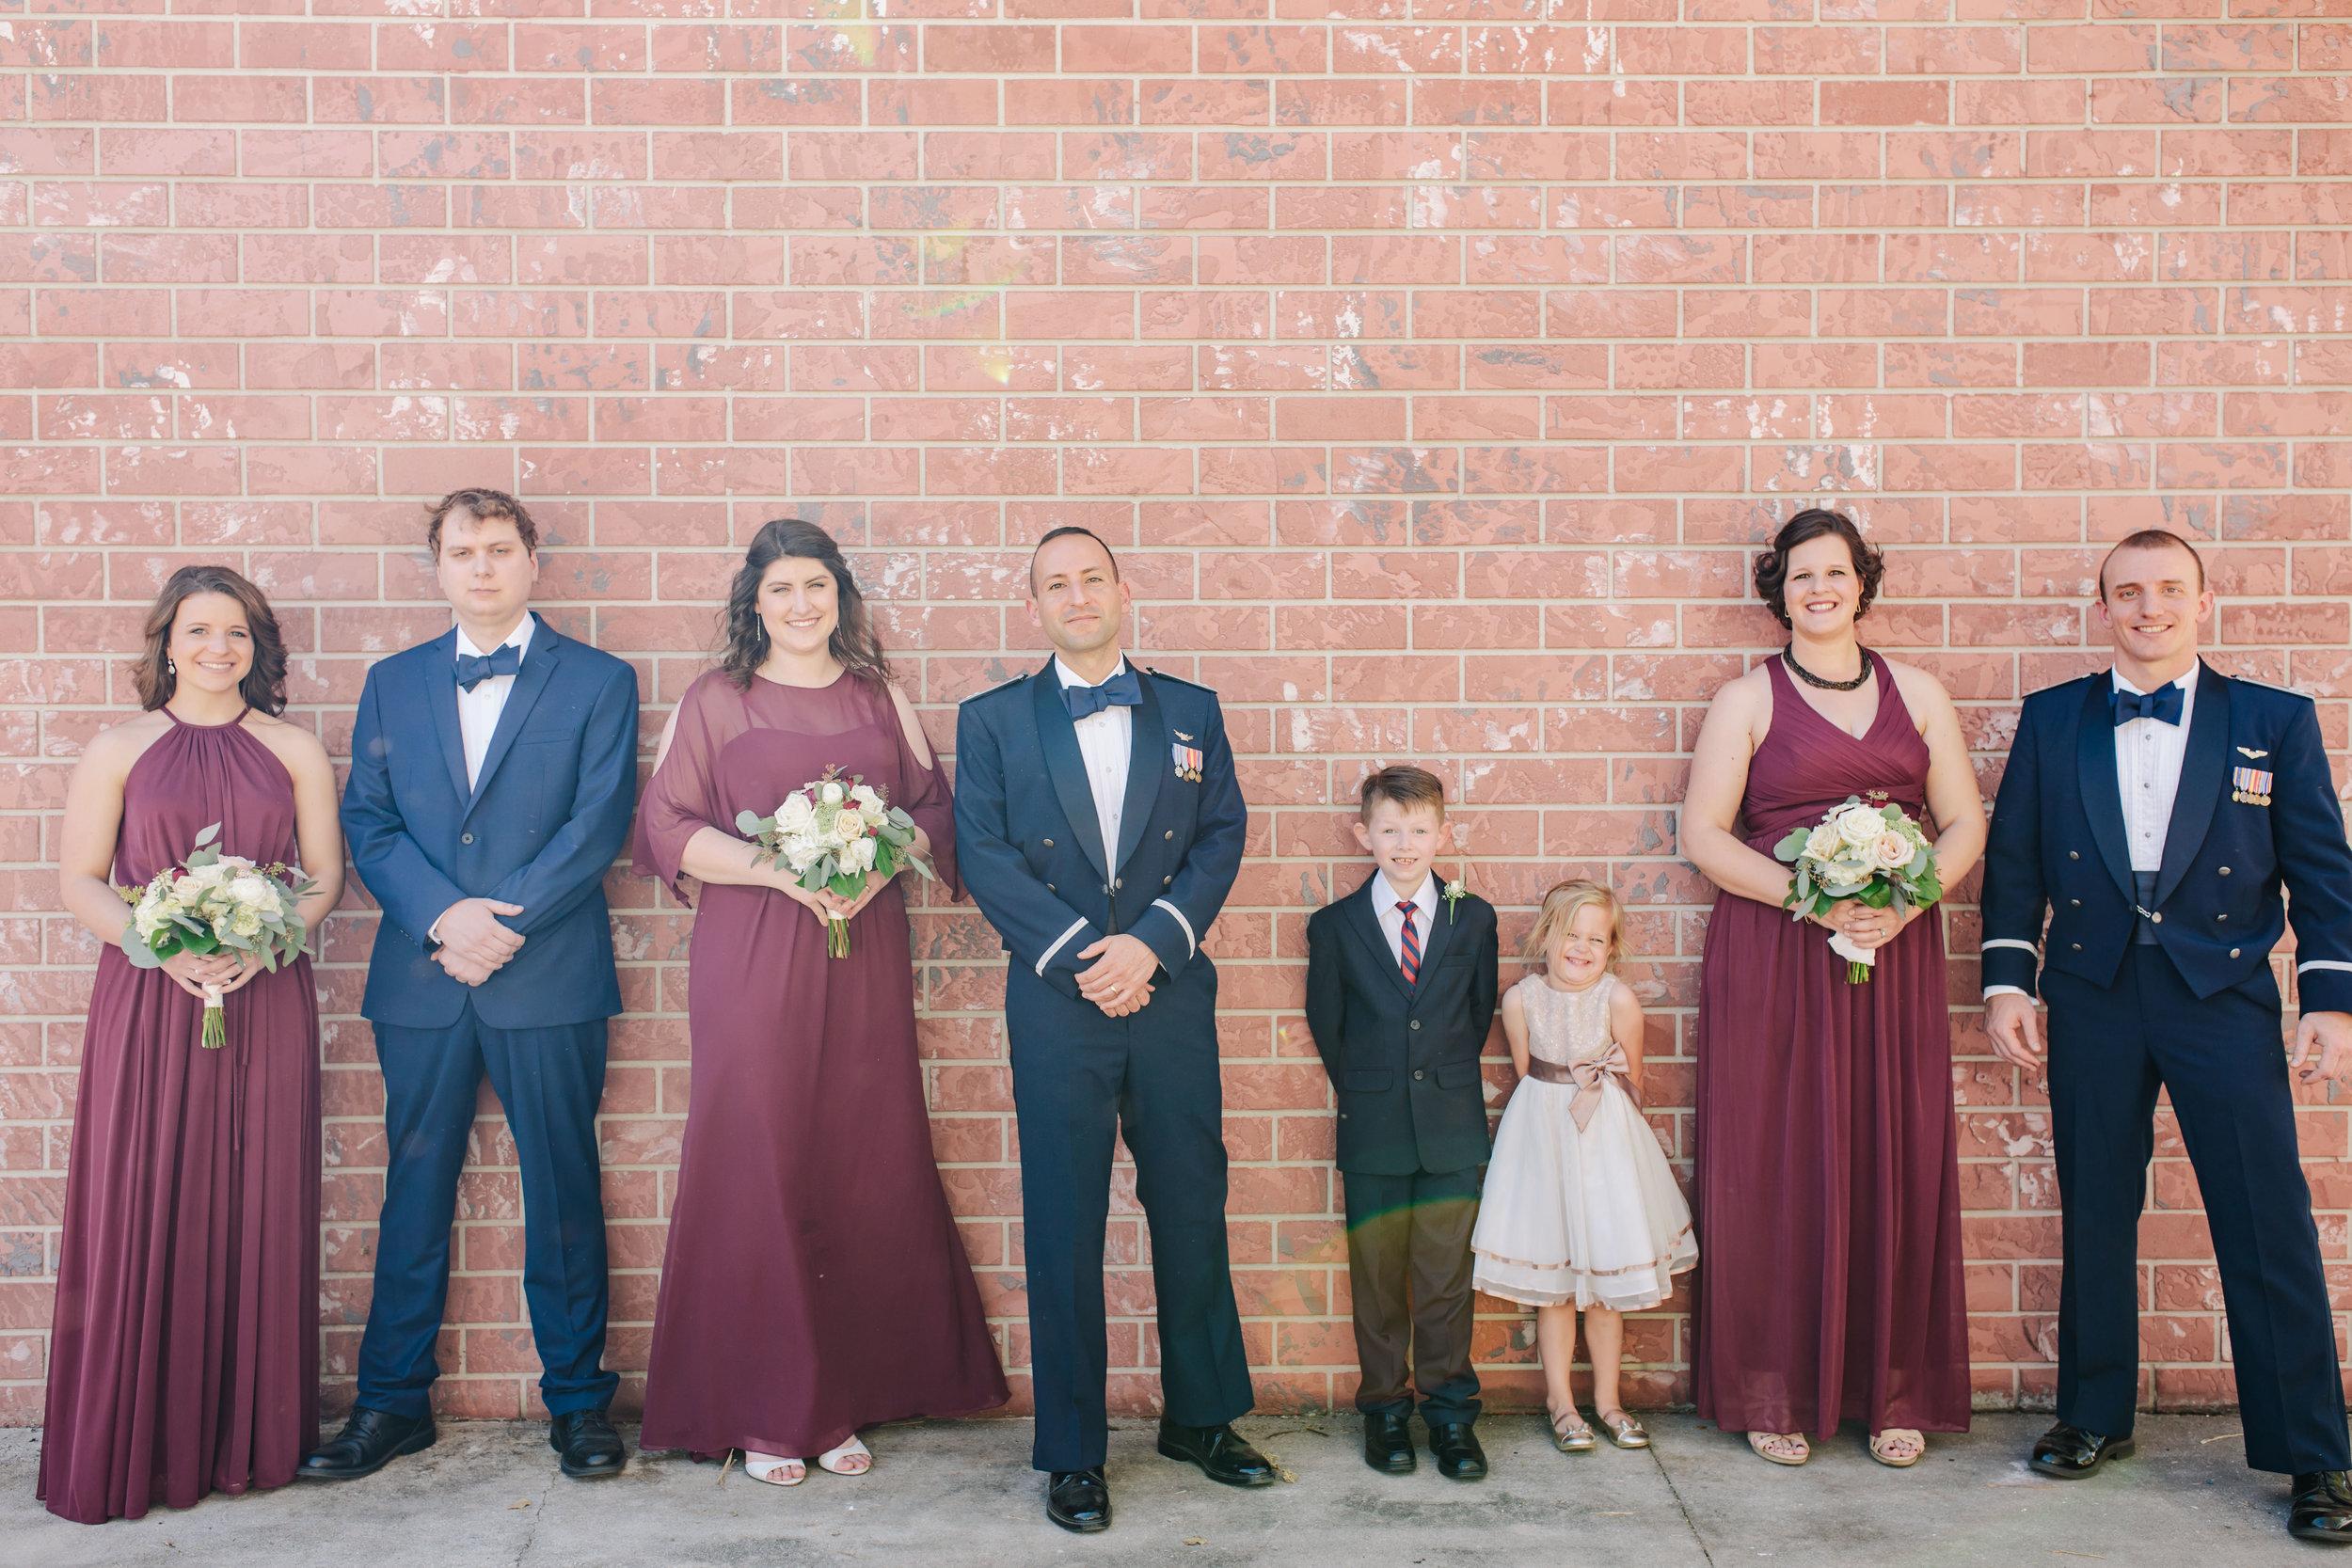 2018.03.17 Allison and Chuck Wedding Waelti Melbourne (441 of 569).jpg